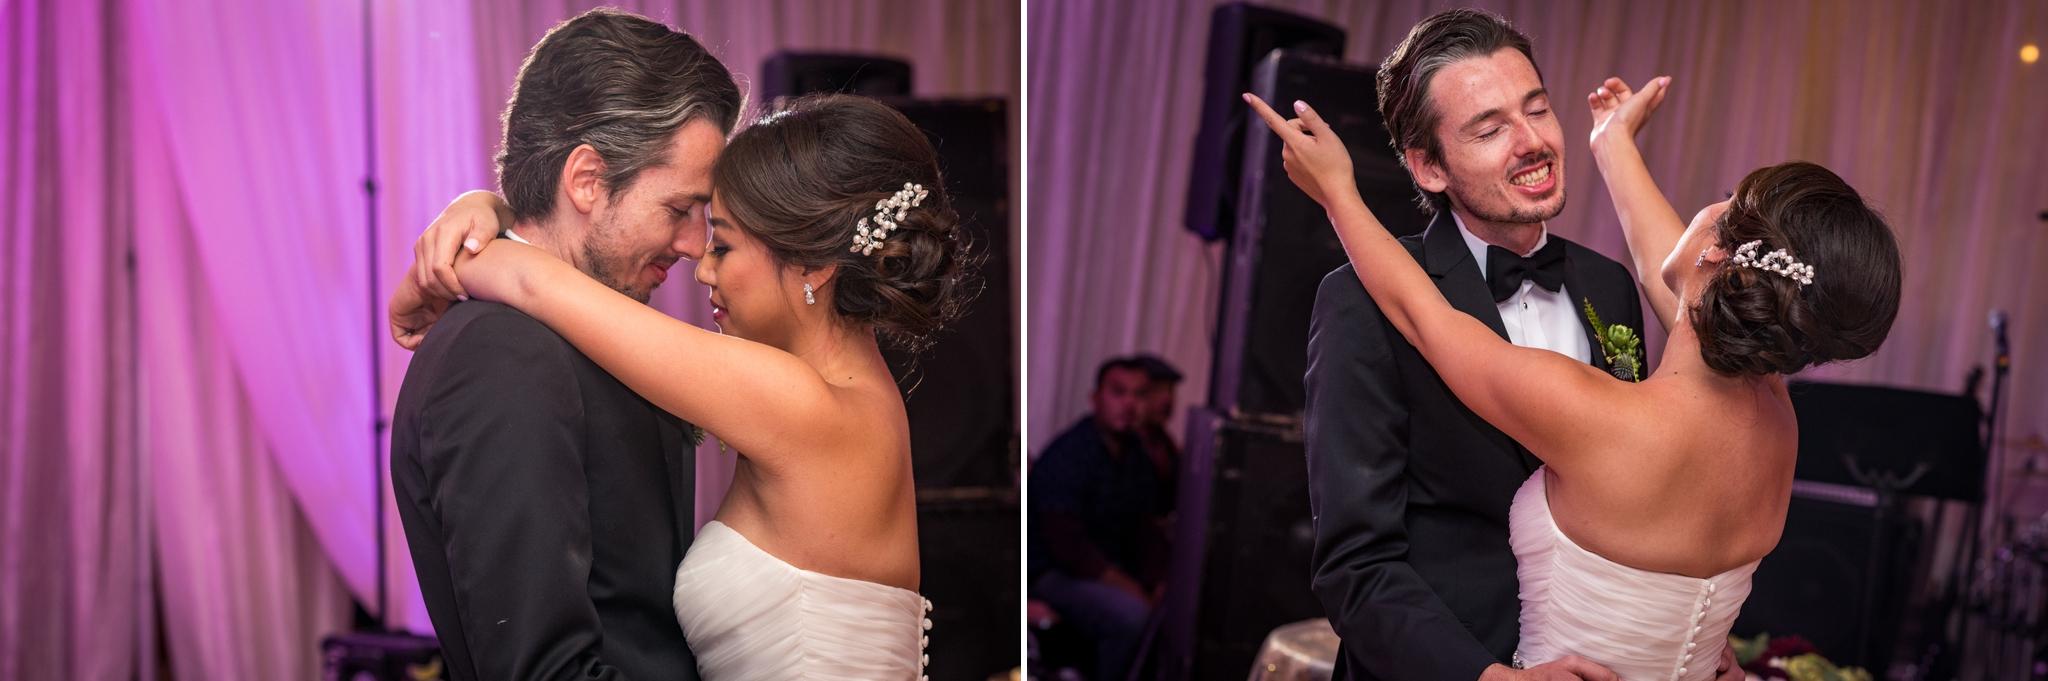 Lancy-Adam-First-Dance-Wedding-Hakone-Saratoga-Satvedi-Photography